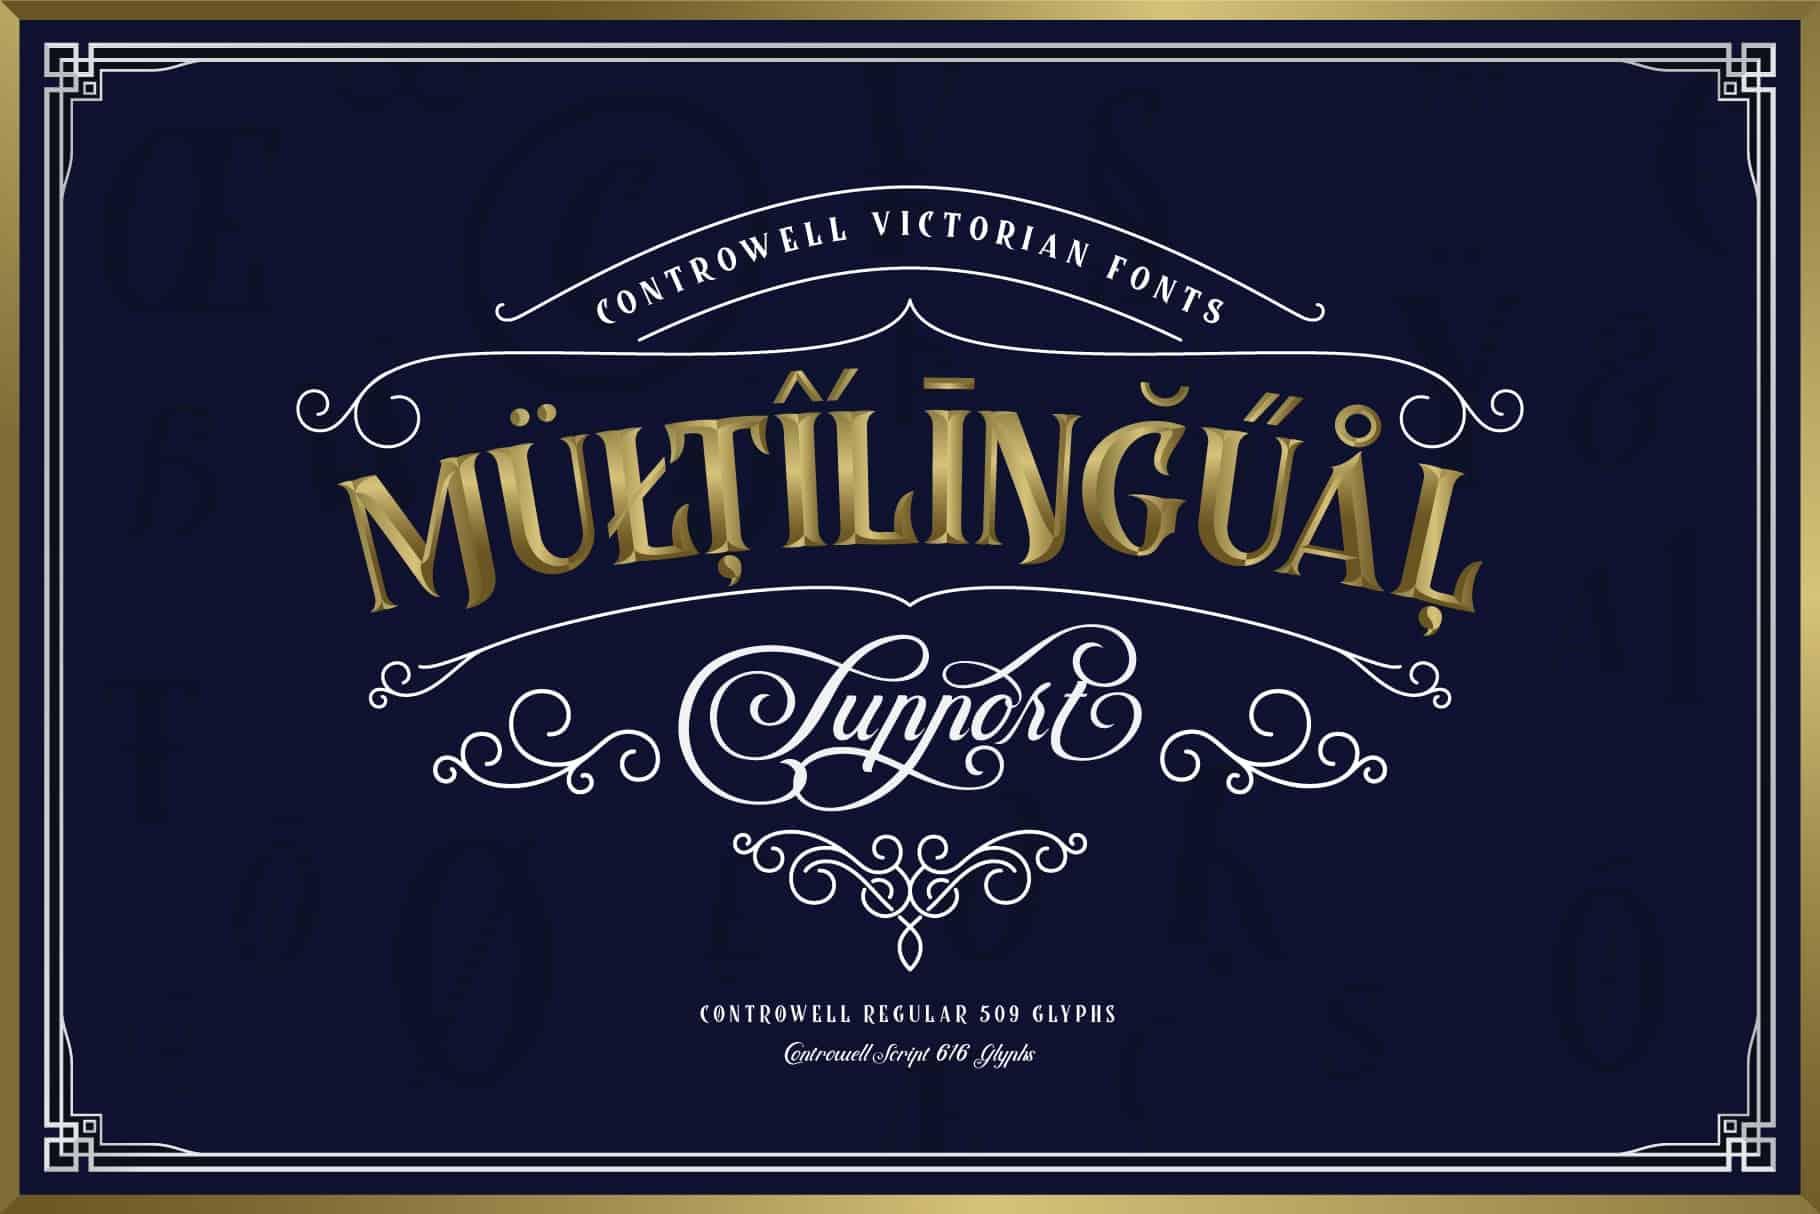 Controwell Victorian Typeface шрифт скачать бесплатно